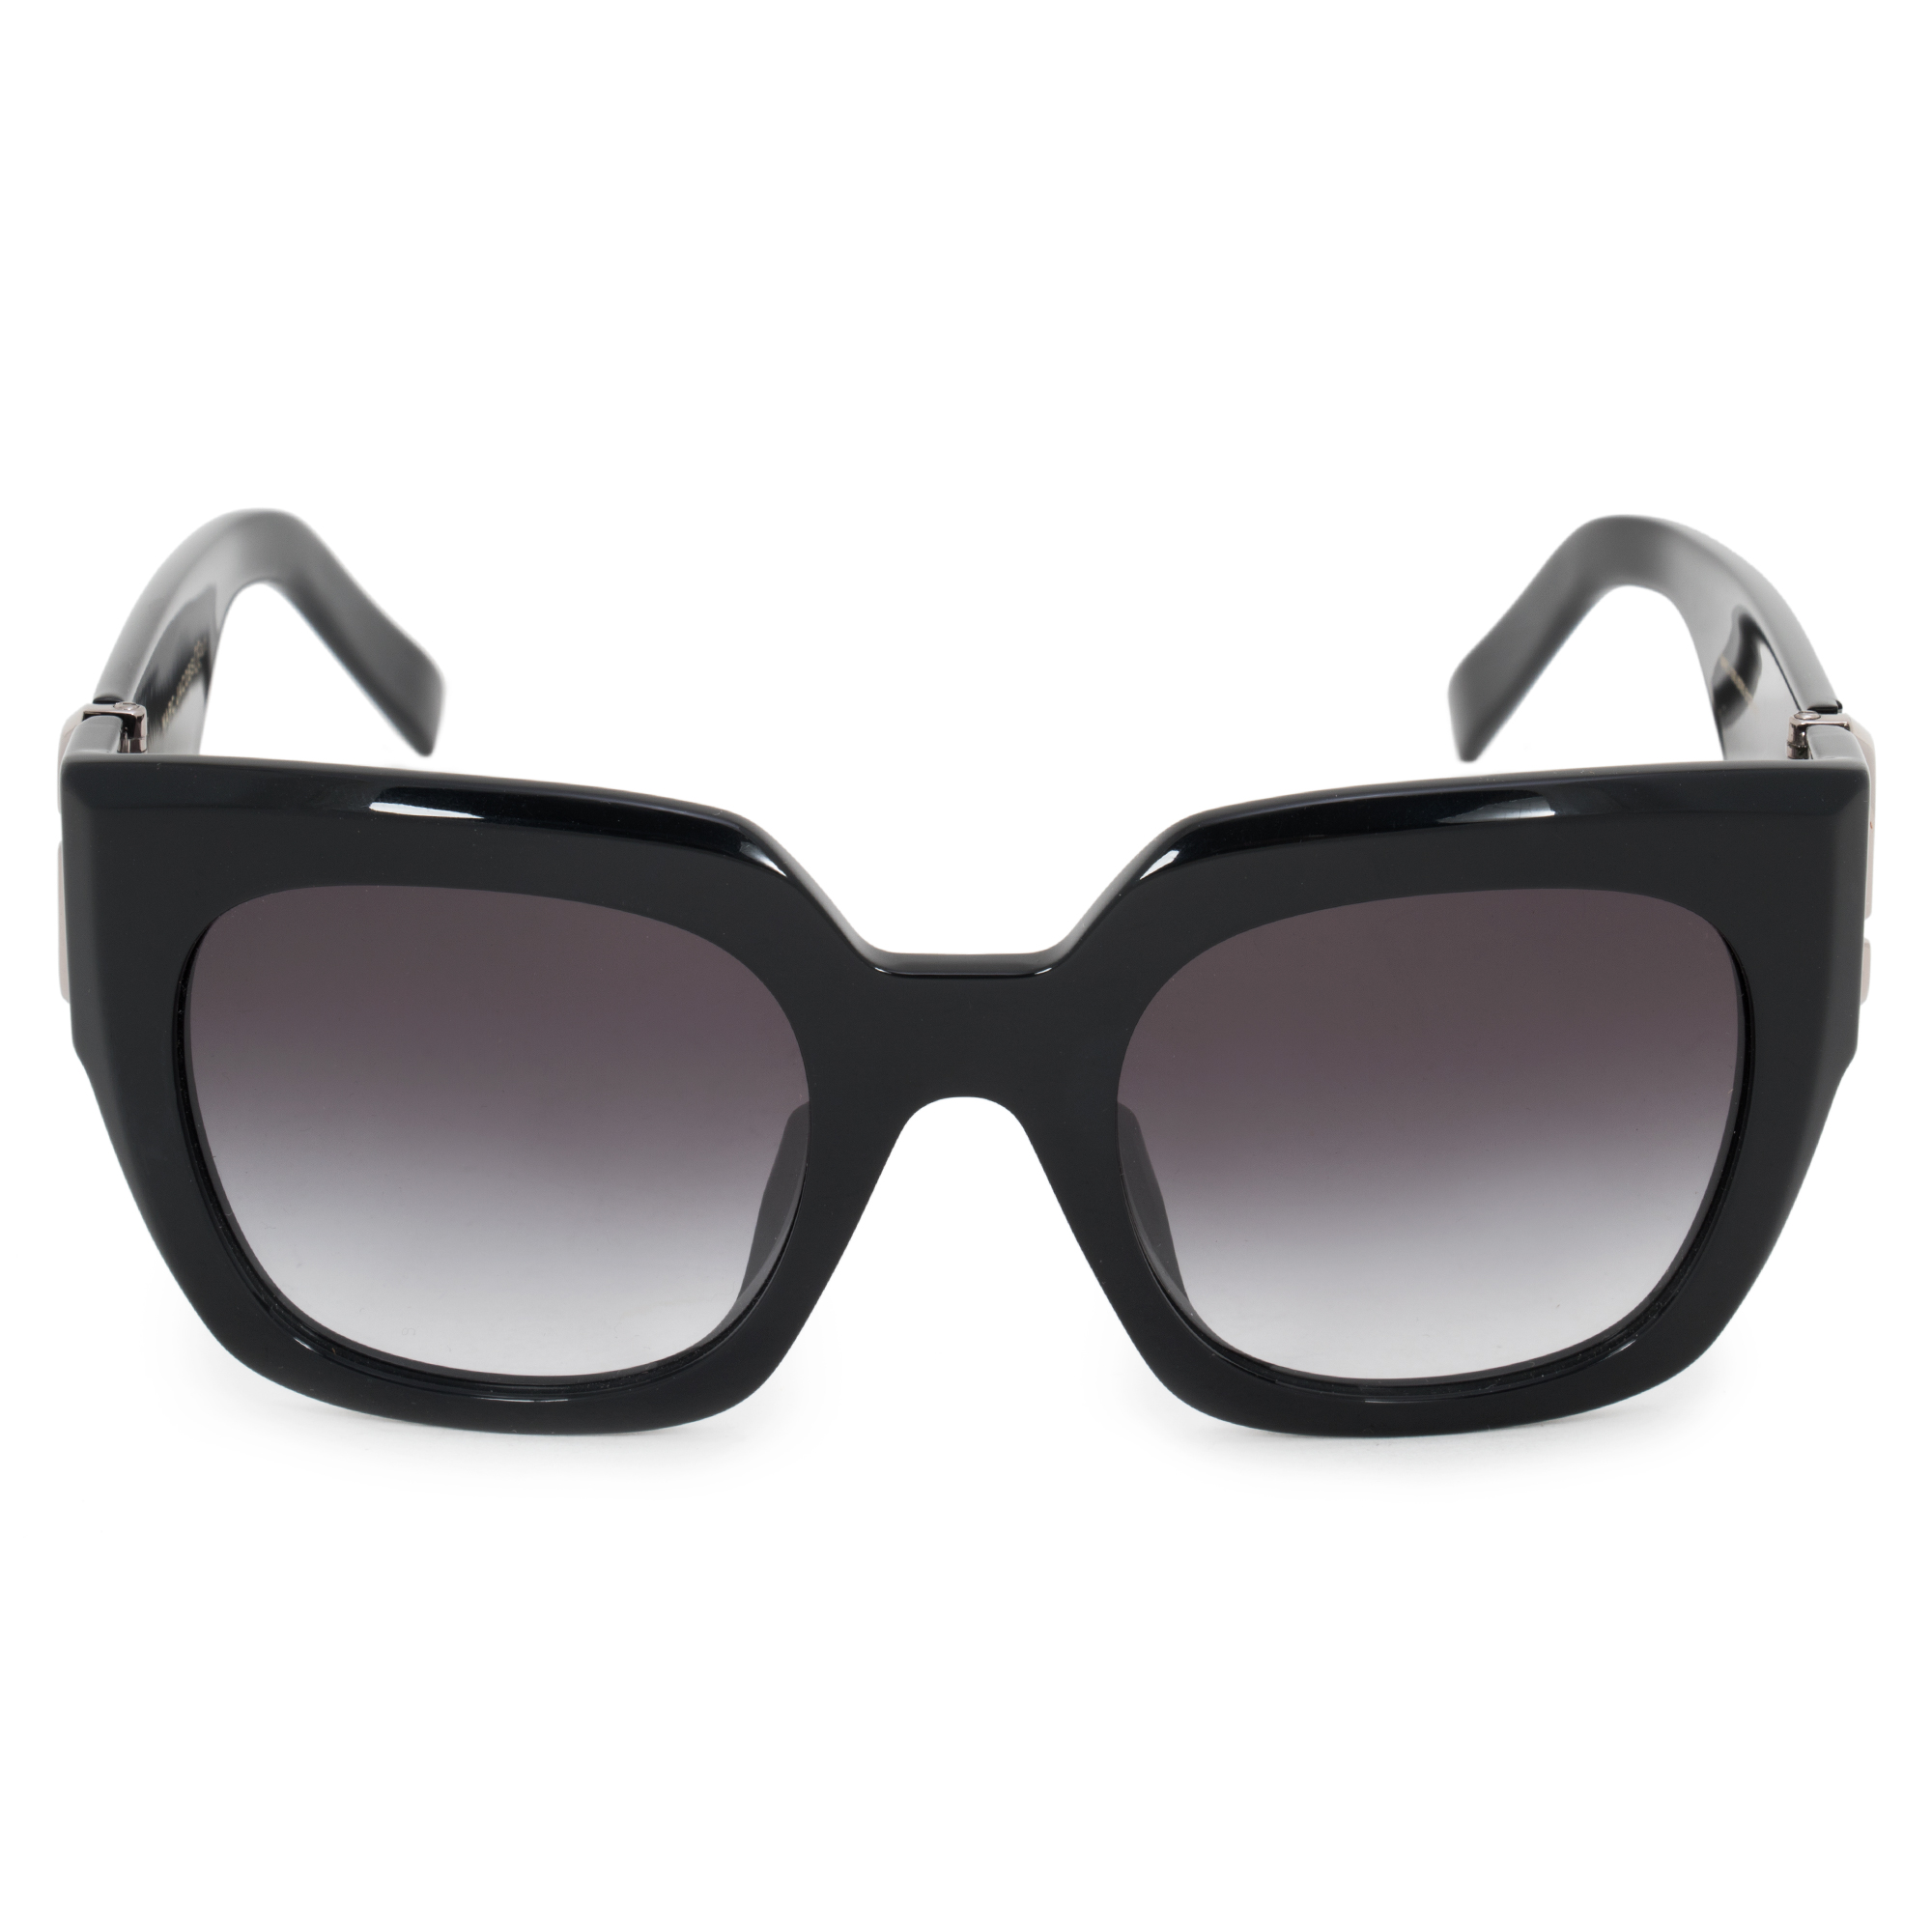 2b2b7f33d1c Marc Jacobs Marc Jacobs Cateye Sunglasses MJ110S 807 9O 51 ...